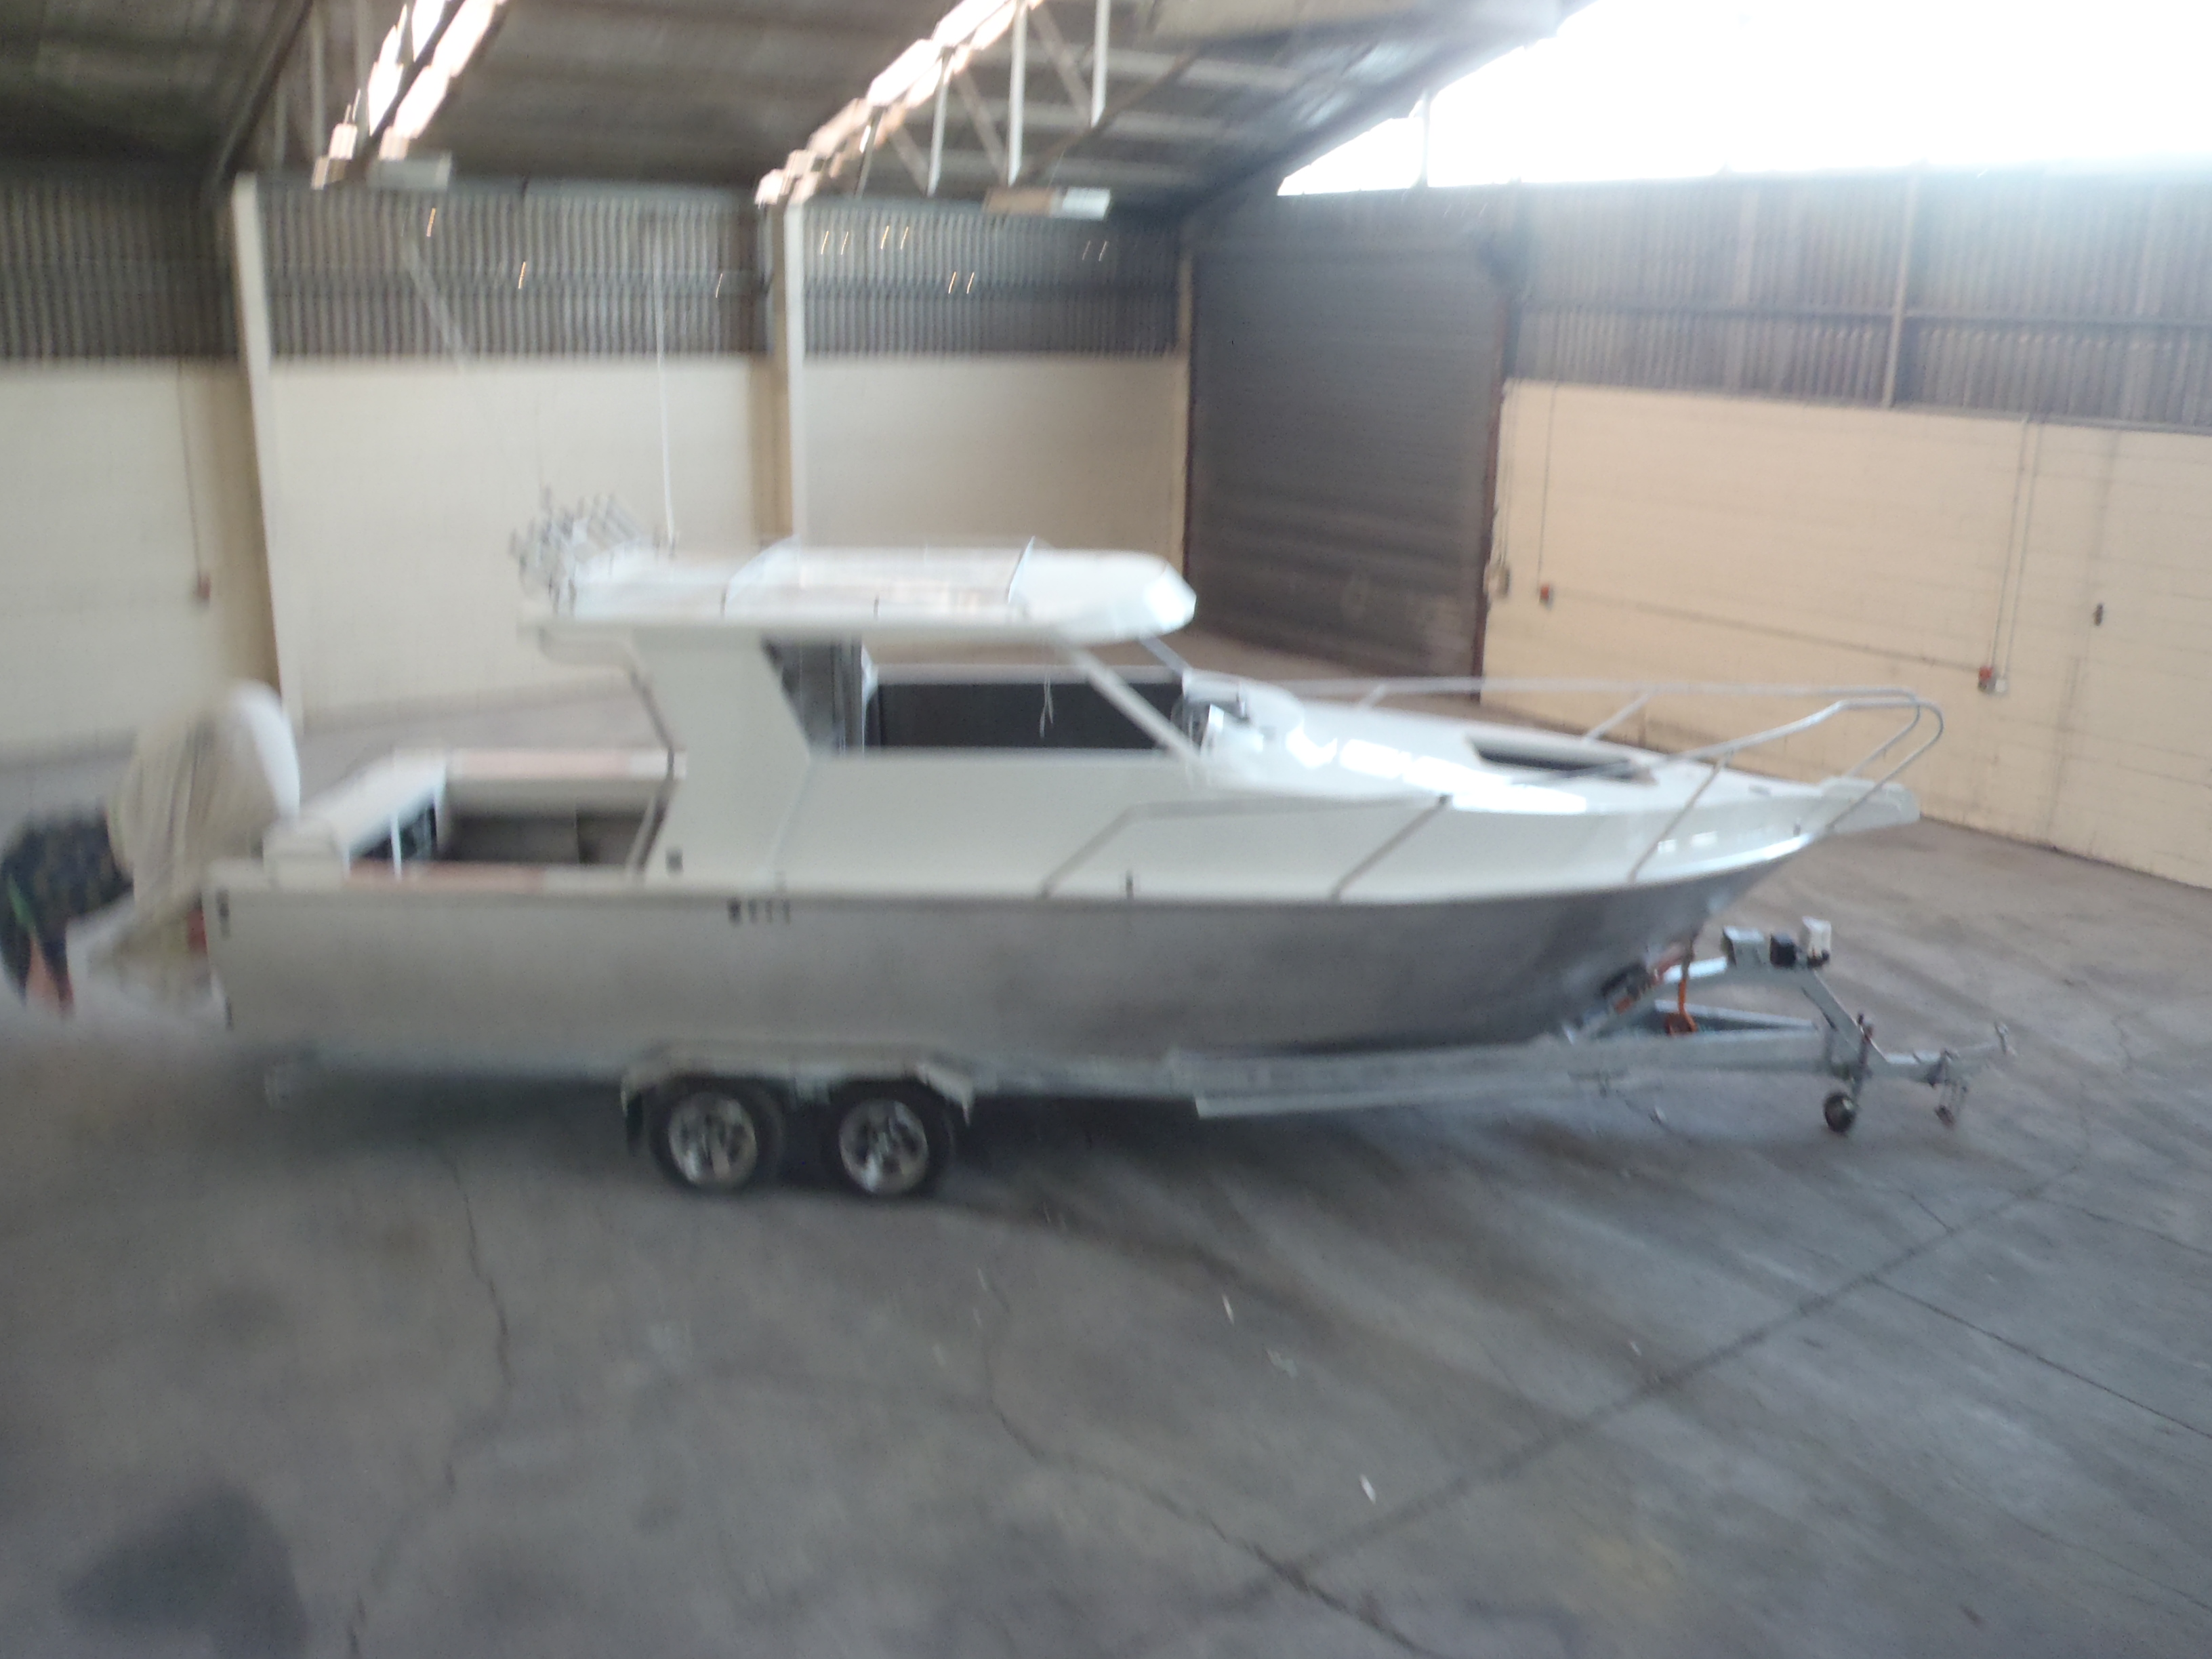 Boat 001.JPG